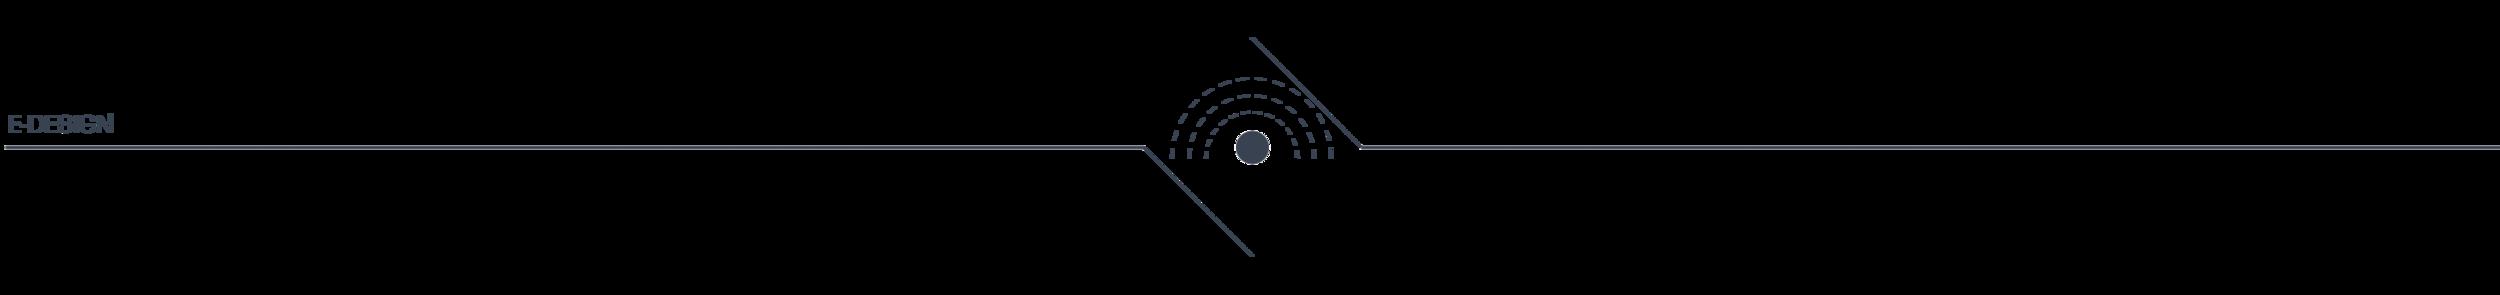 E-Design-longad.png